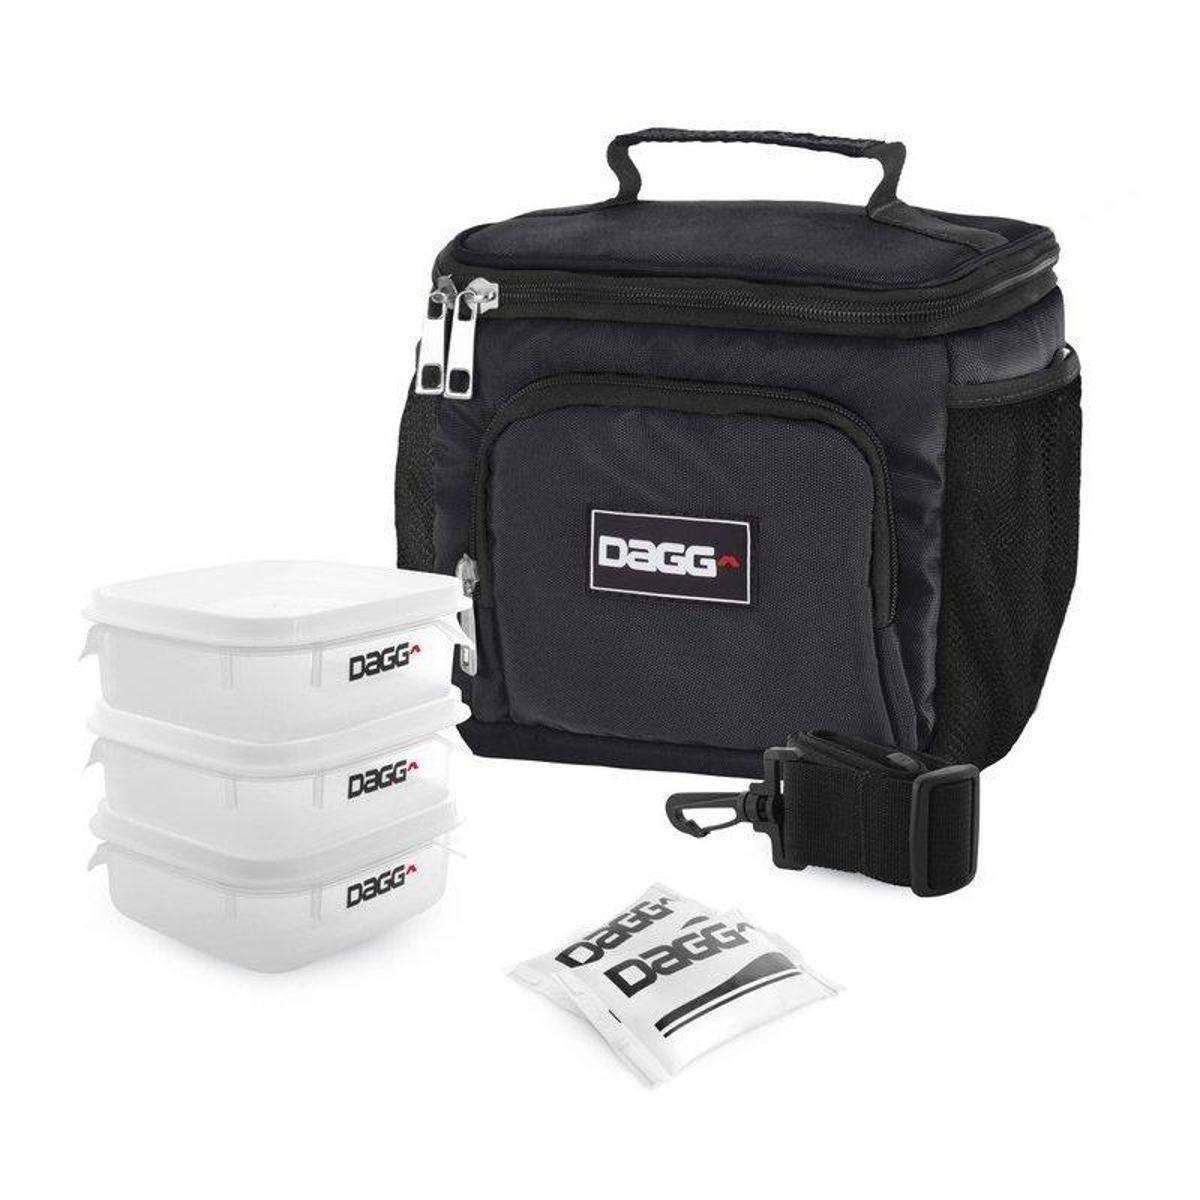 Fitness Kit Dagg Térmica com Kit Preto com Bolsa n4Fa7Zz8q